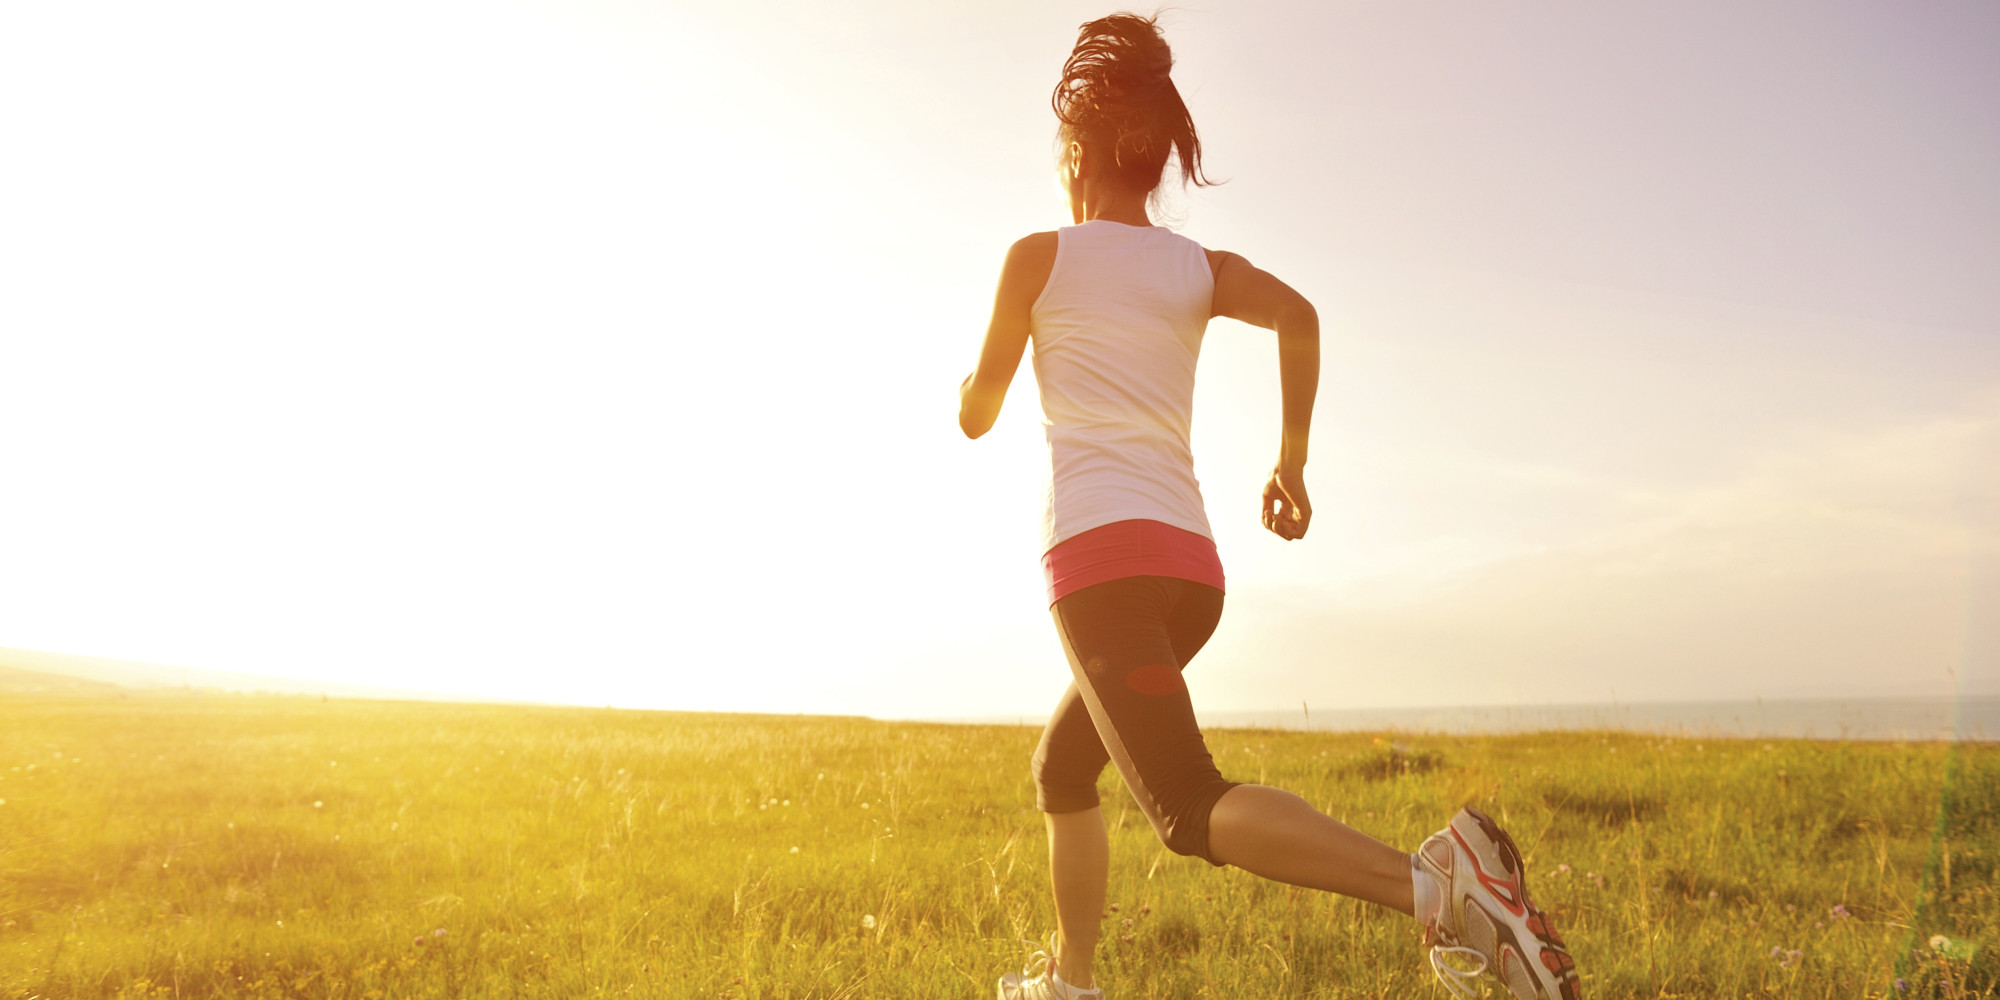 alkalmas-e magas vérnyomás esetén hogyan kell inni a cardiomagnumot magas vérnyomás esetén